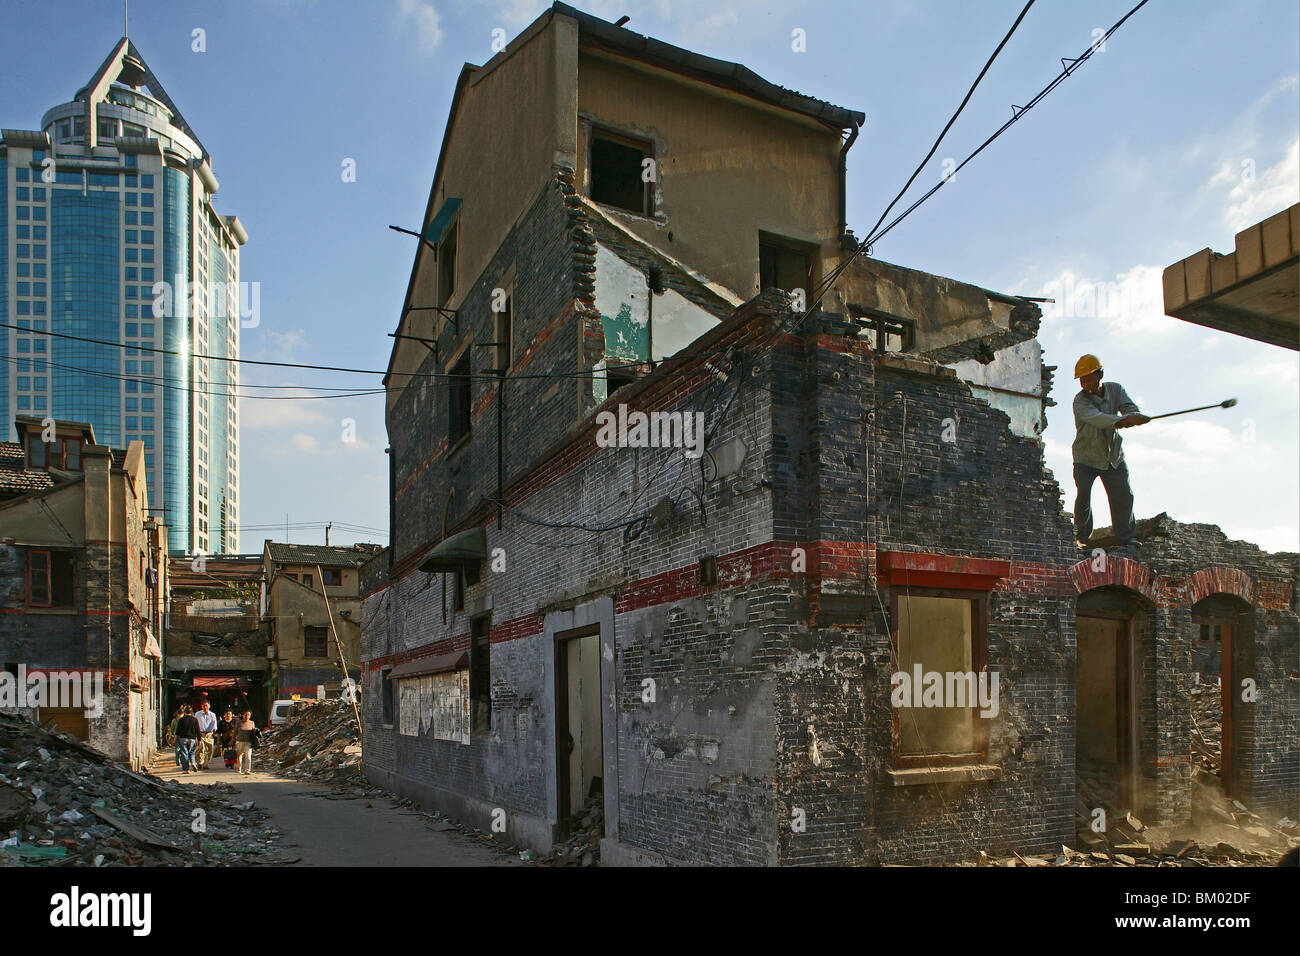 demolitian Hongkou, demolition worker, redevelopment area - Stock Image